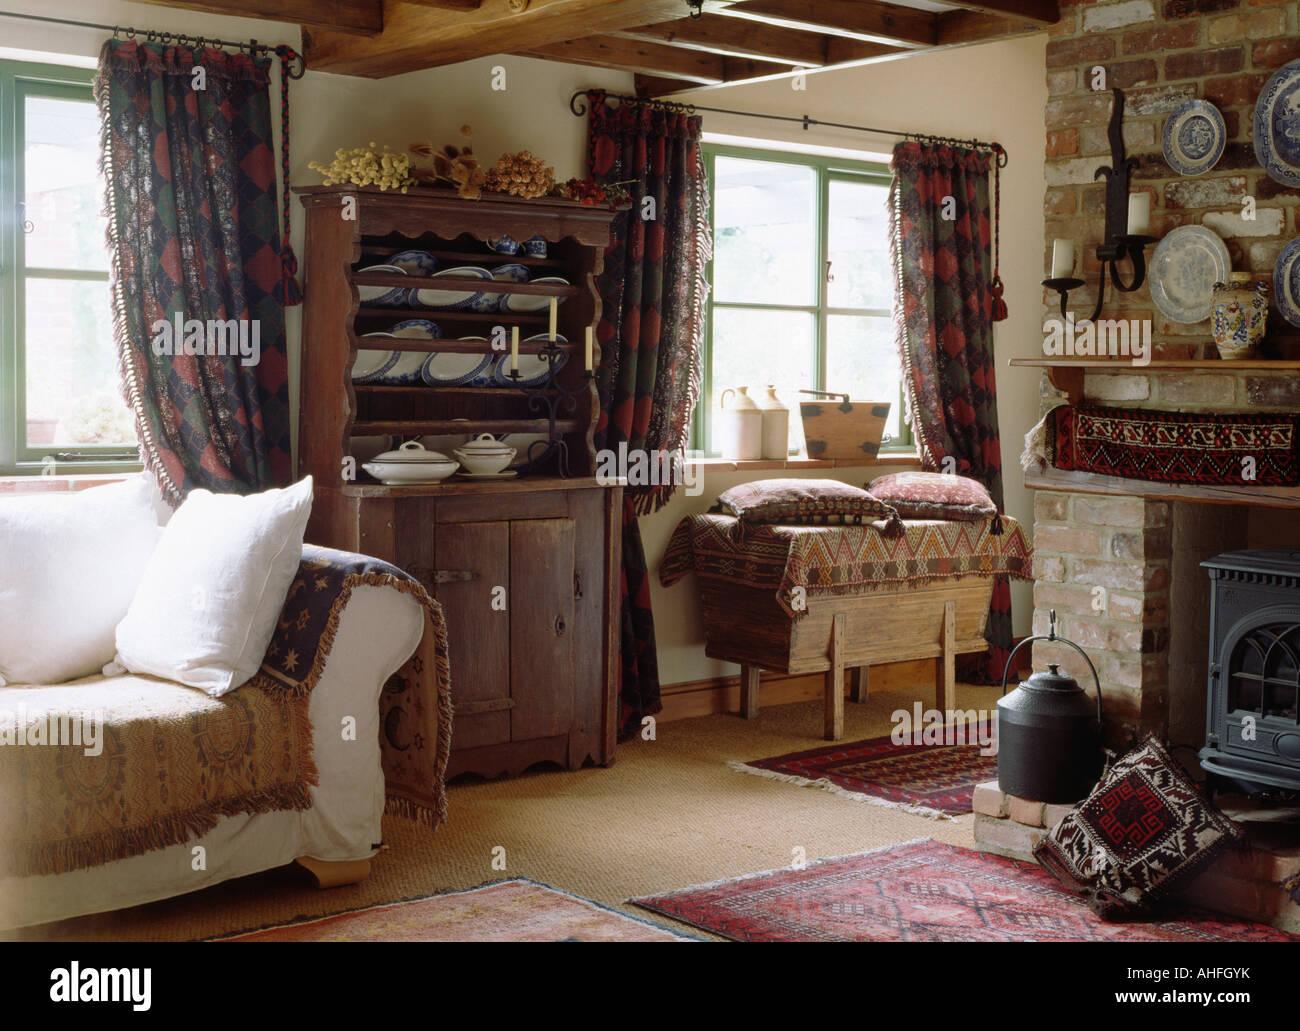 Antique Pine Dresser Beside Cream Sofa In Cottage Living Room